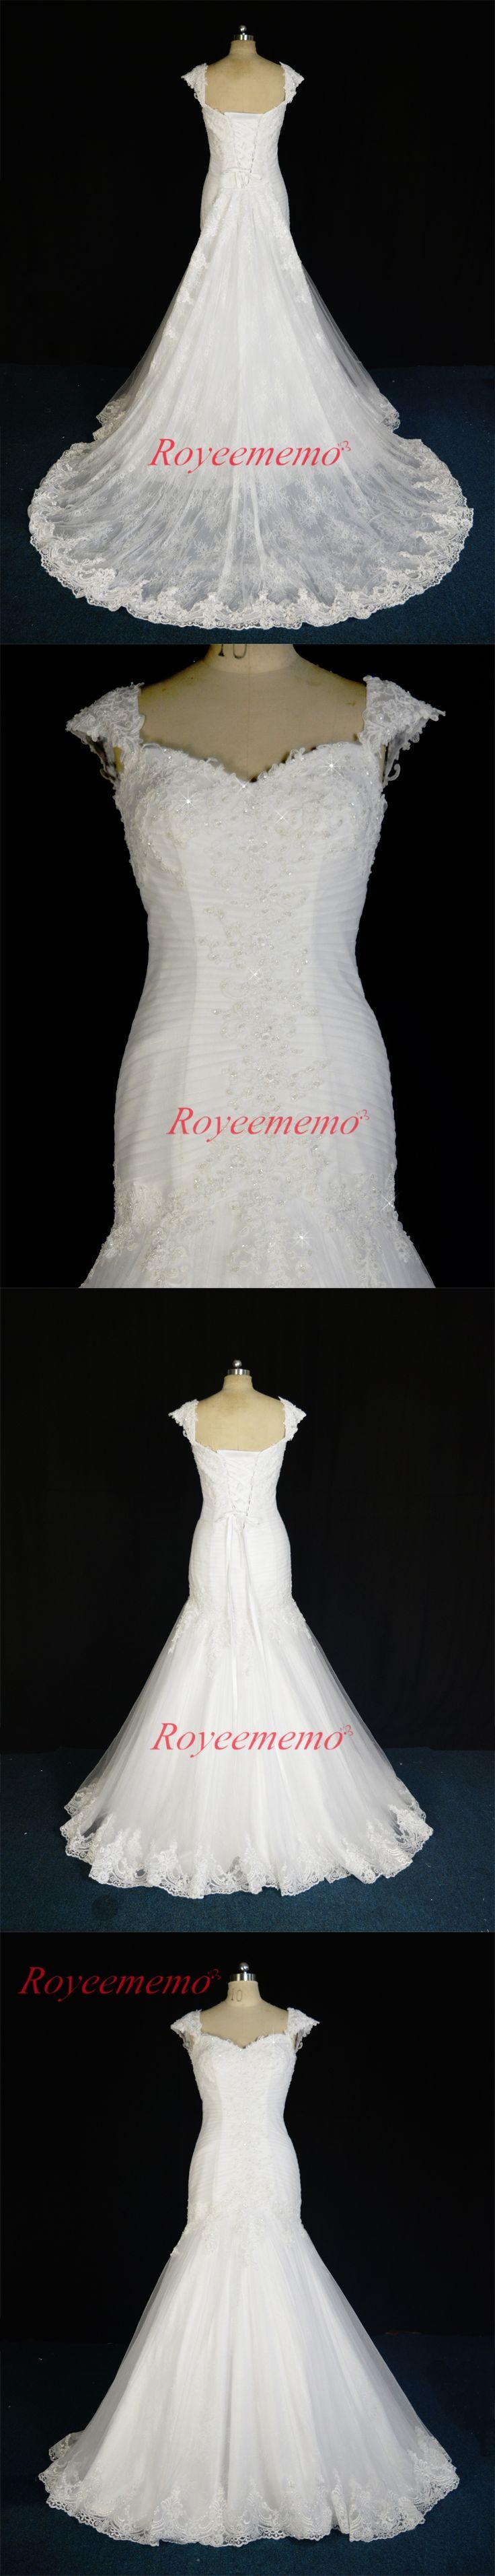 2017 new design lace mermaid detachable train Wedding dress hot sale bridal dress custom made factory supplier